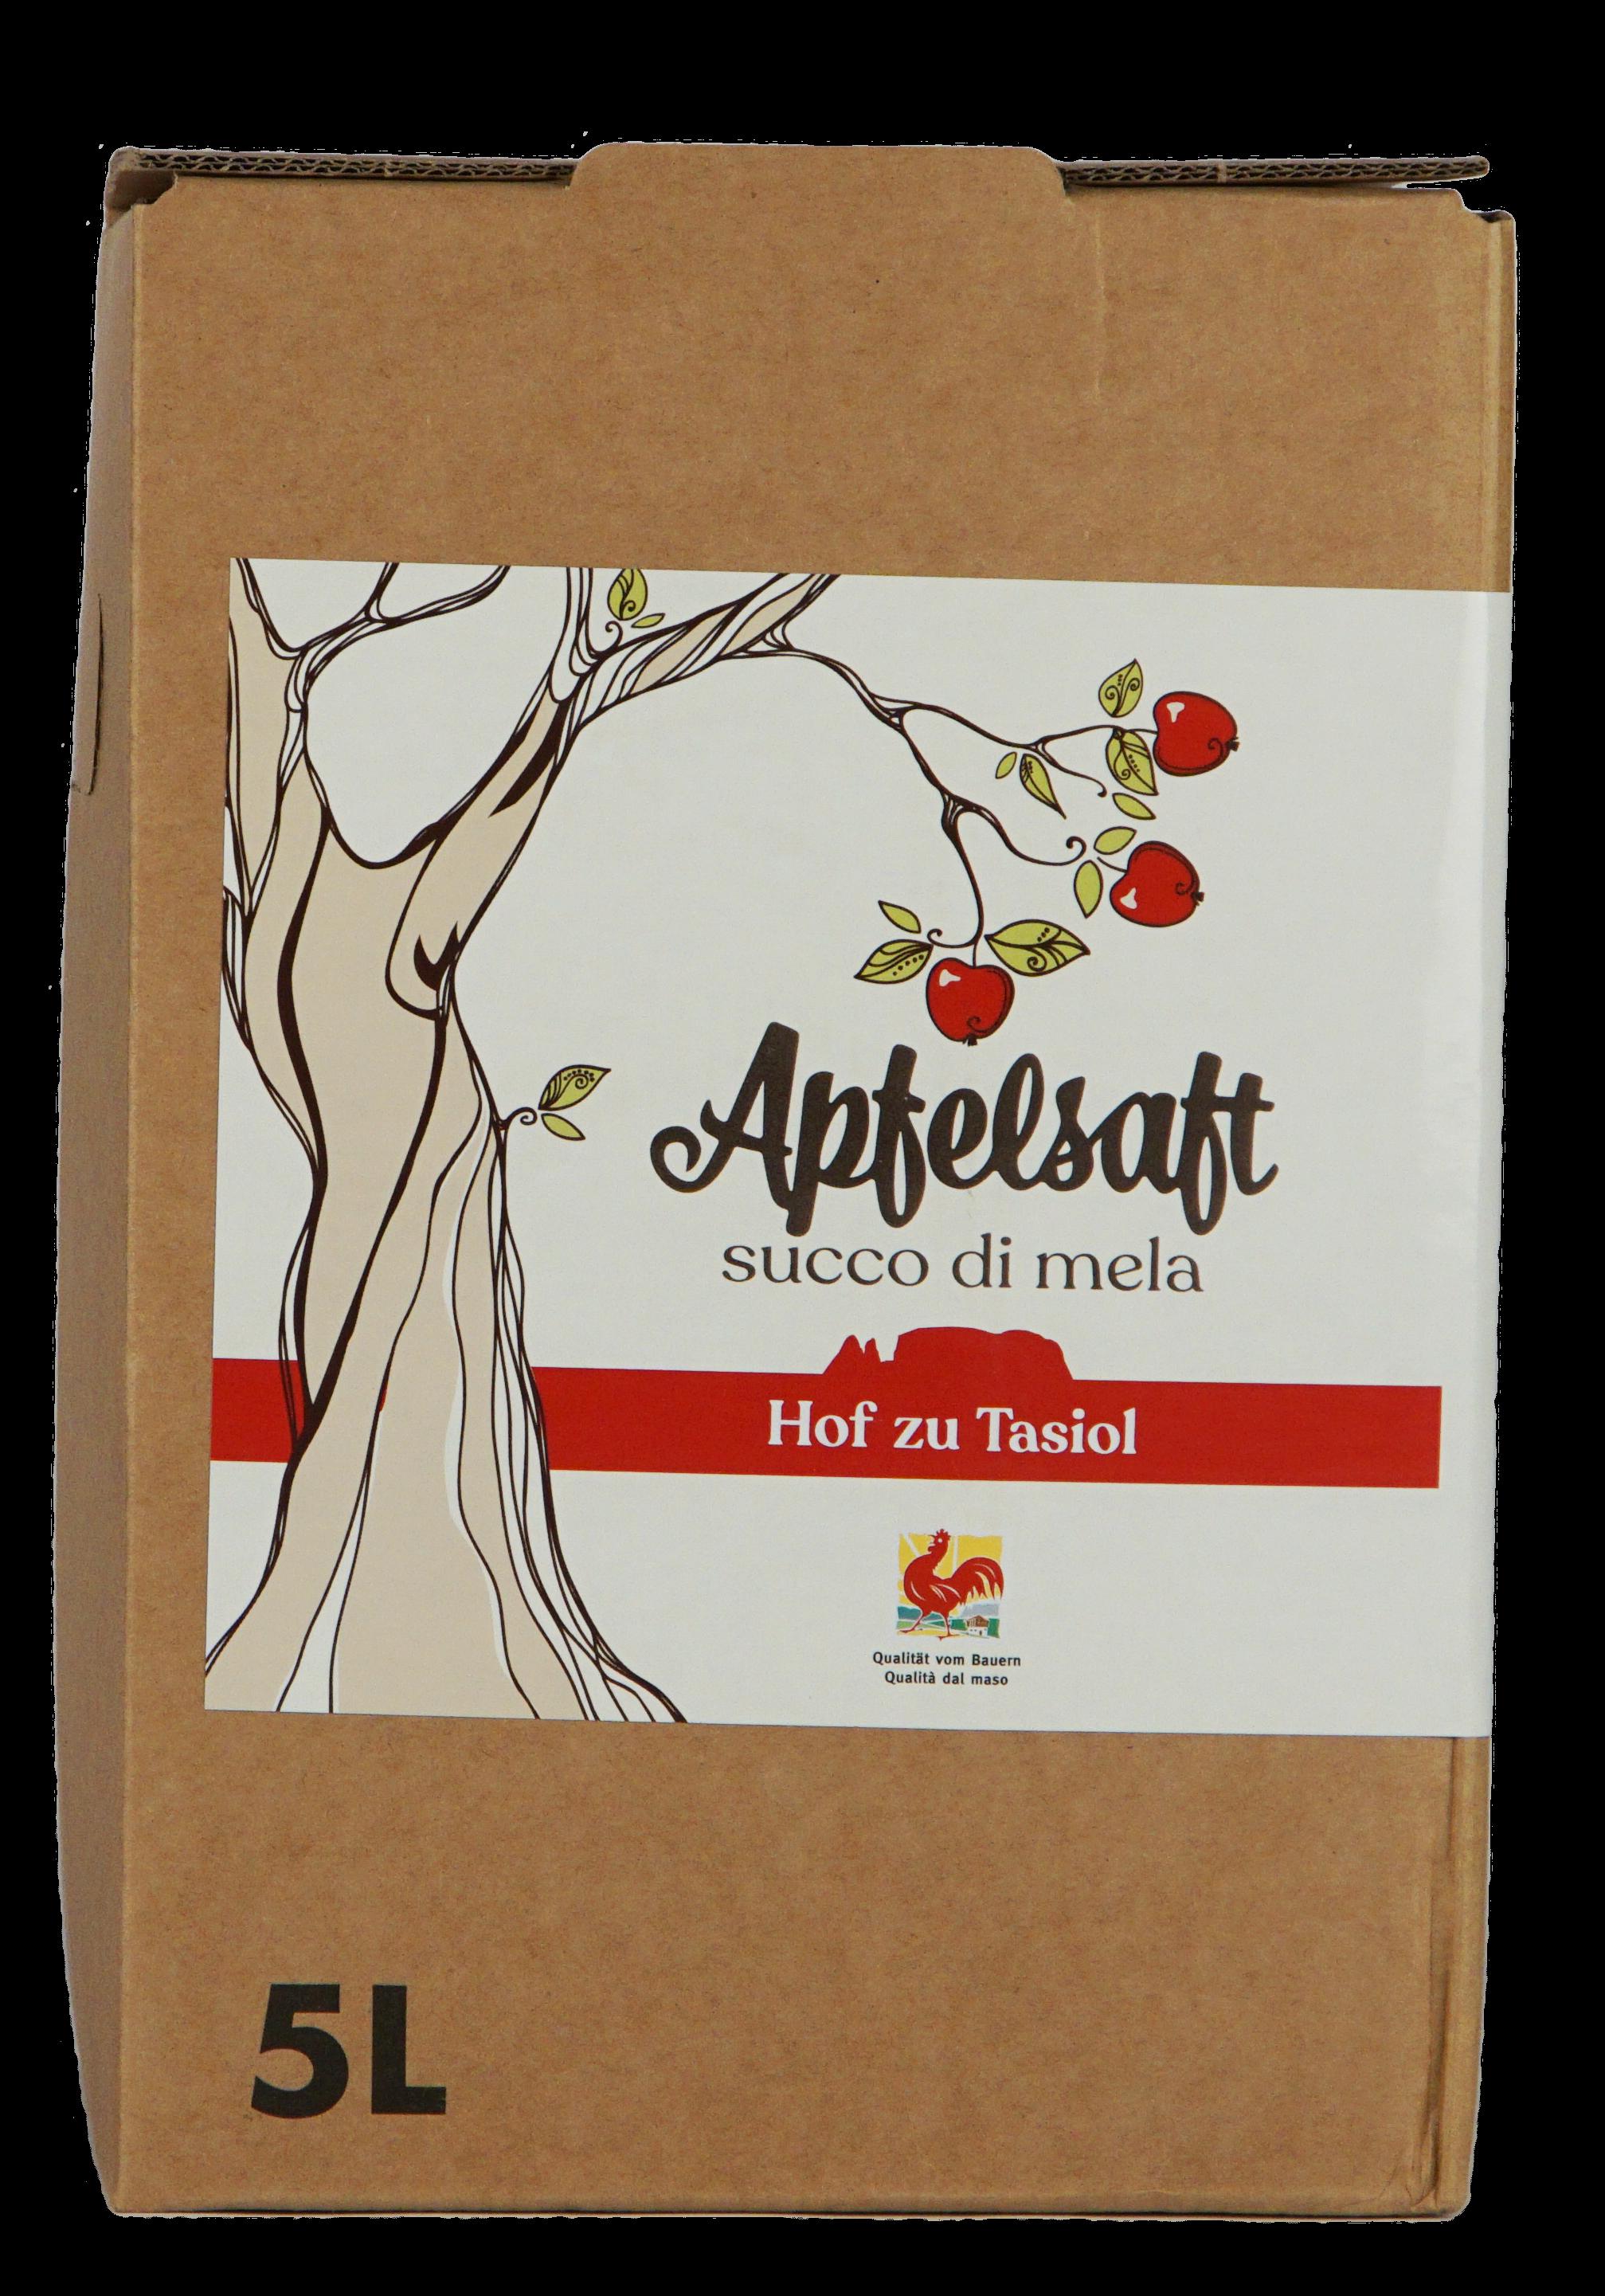 Apfelsaft vom Tasiolerhof 5 l